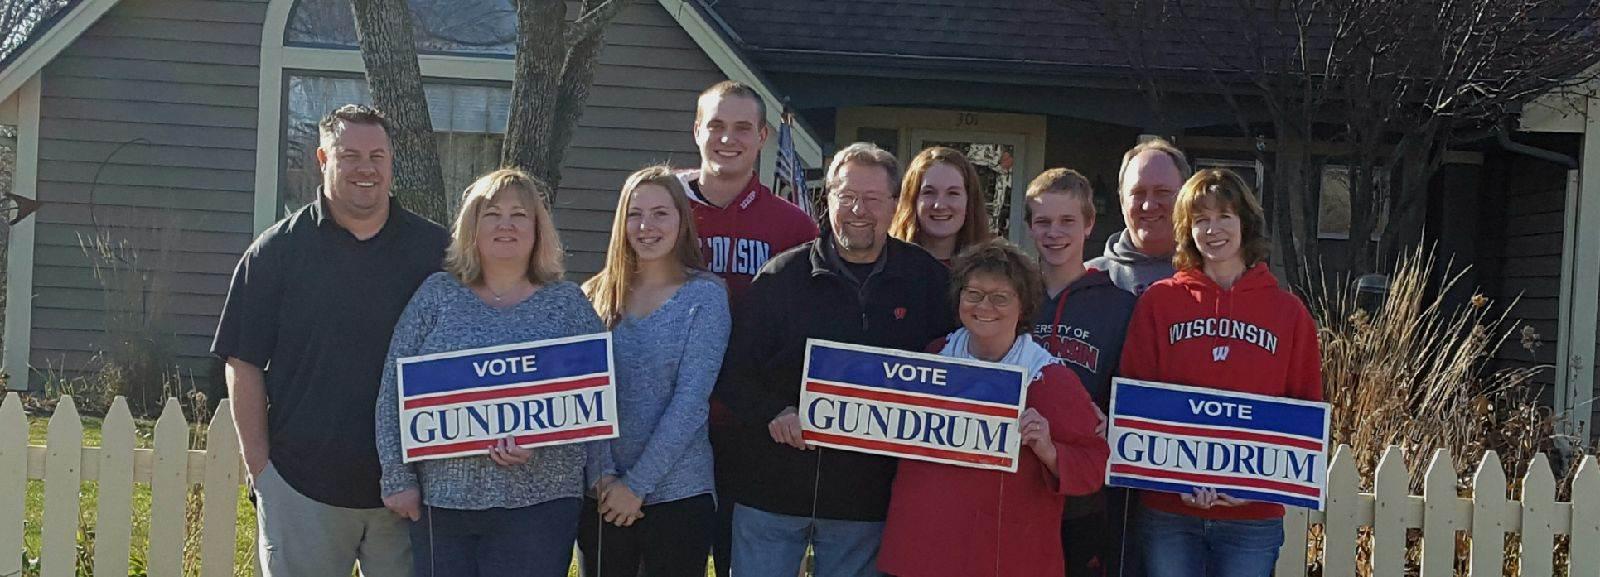 Vote gundrum family Resized (1)